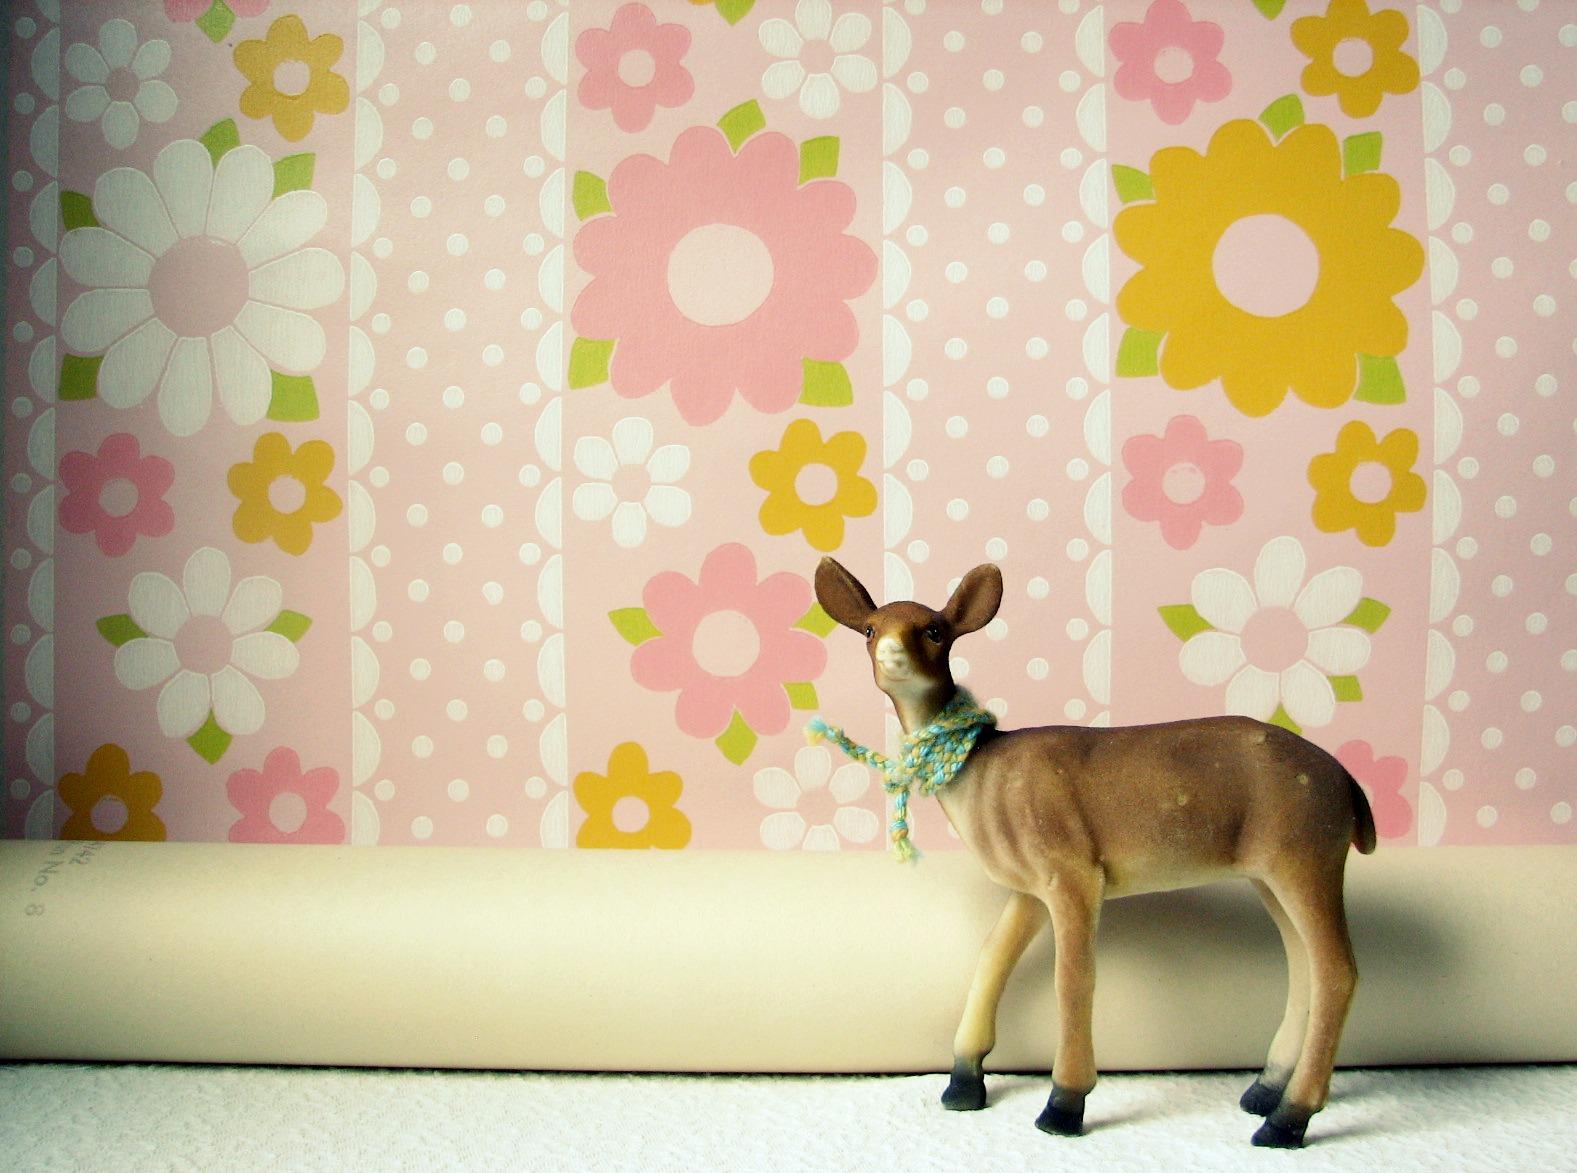 http://4.bp.blogspot.com/-h9K4a3Lv60Y/Tzi3kKUwTuI/AAAAAAAADDY/oQnz1bNyJHw/s1600/Pink+Daisy+Wallpaper+a.jpg